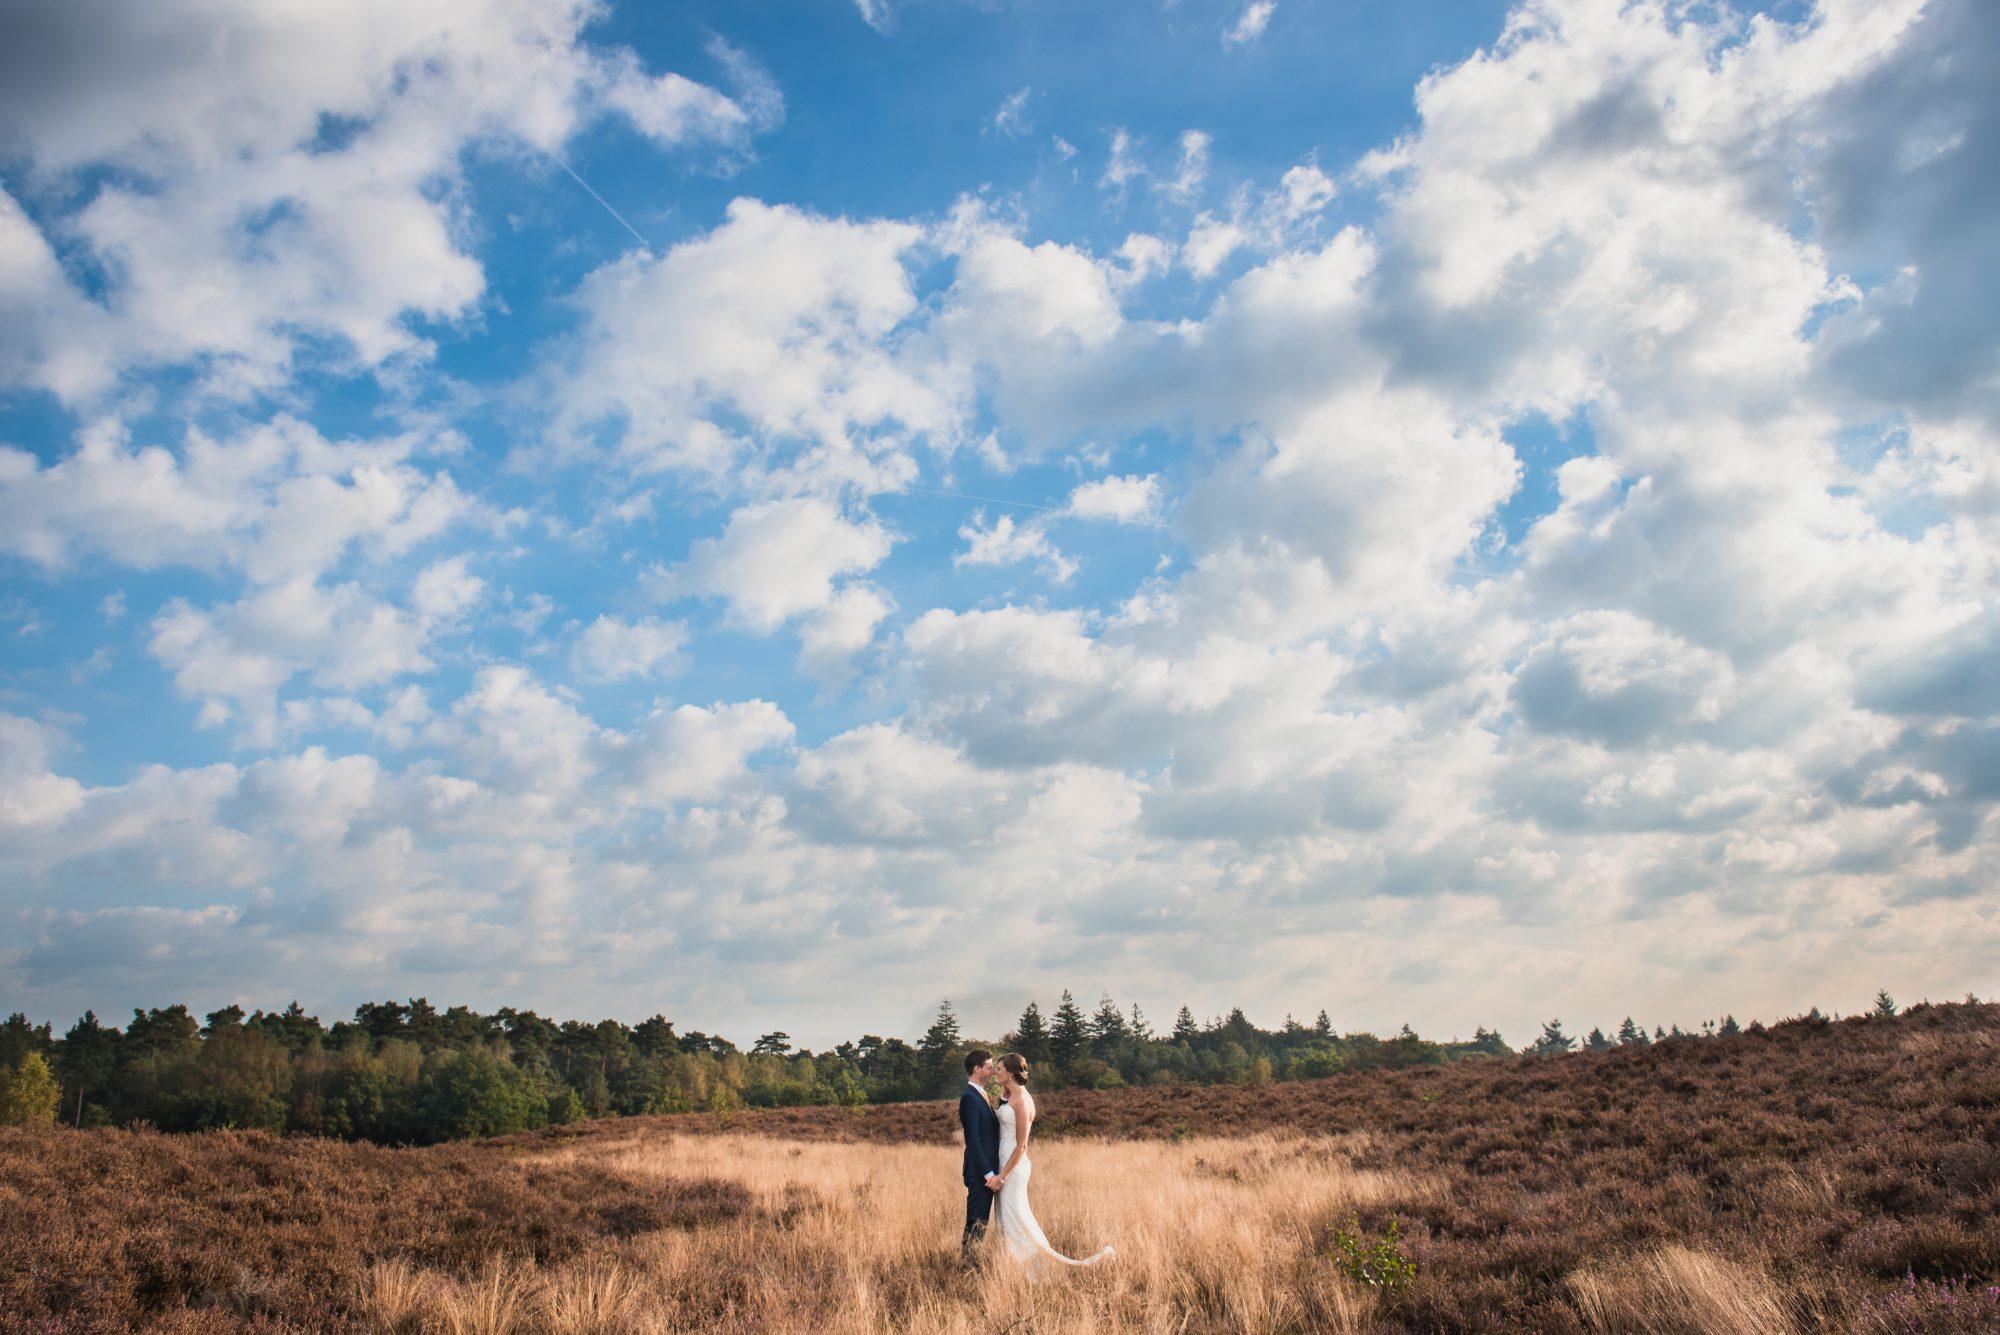 bruiloft-roland-annewil-152